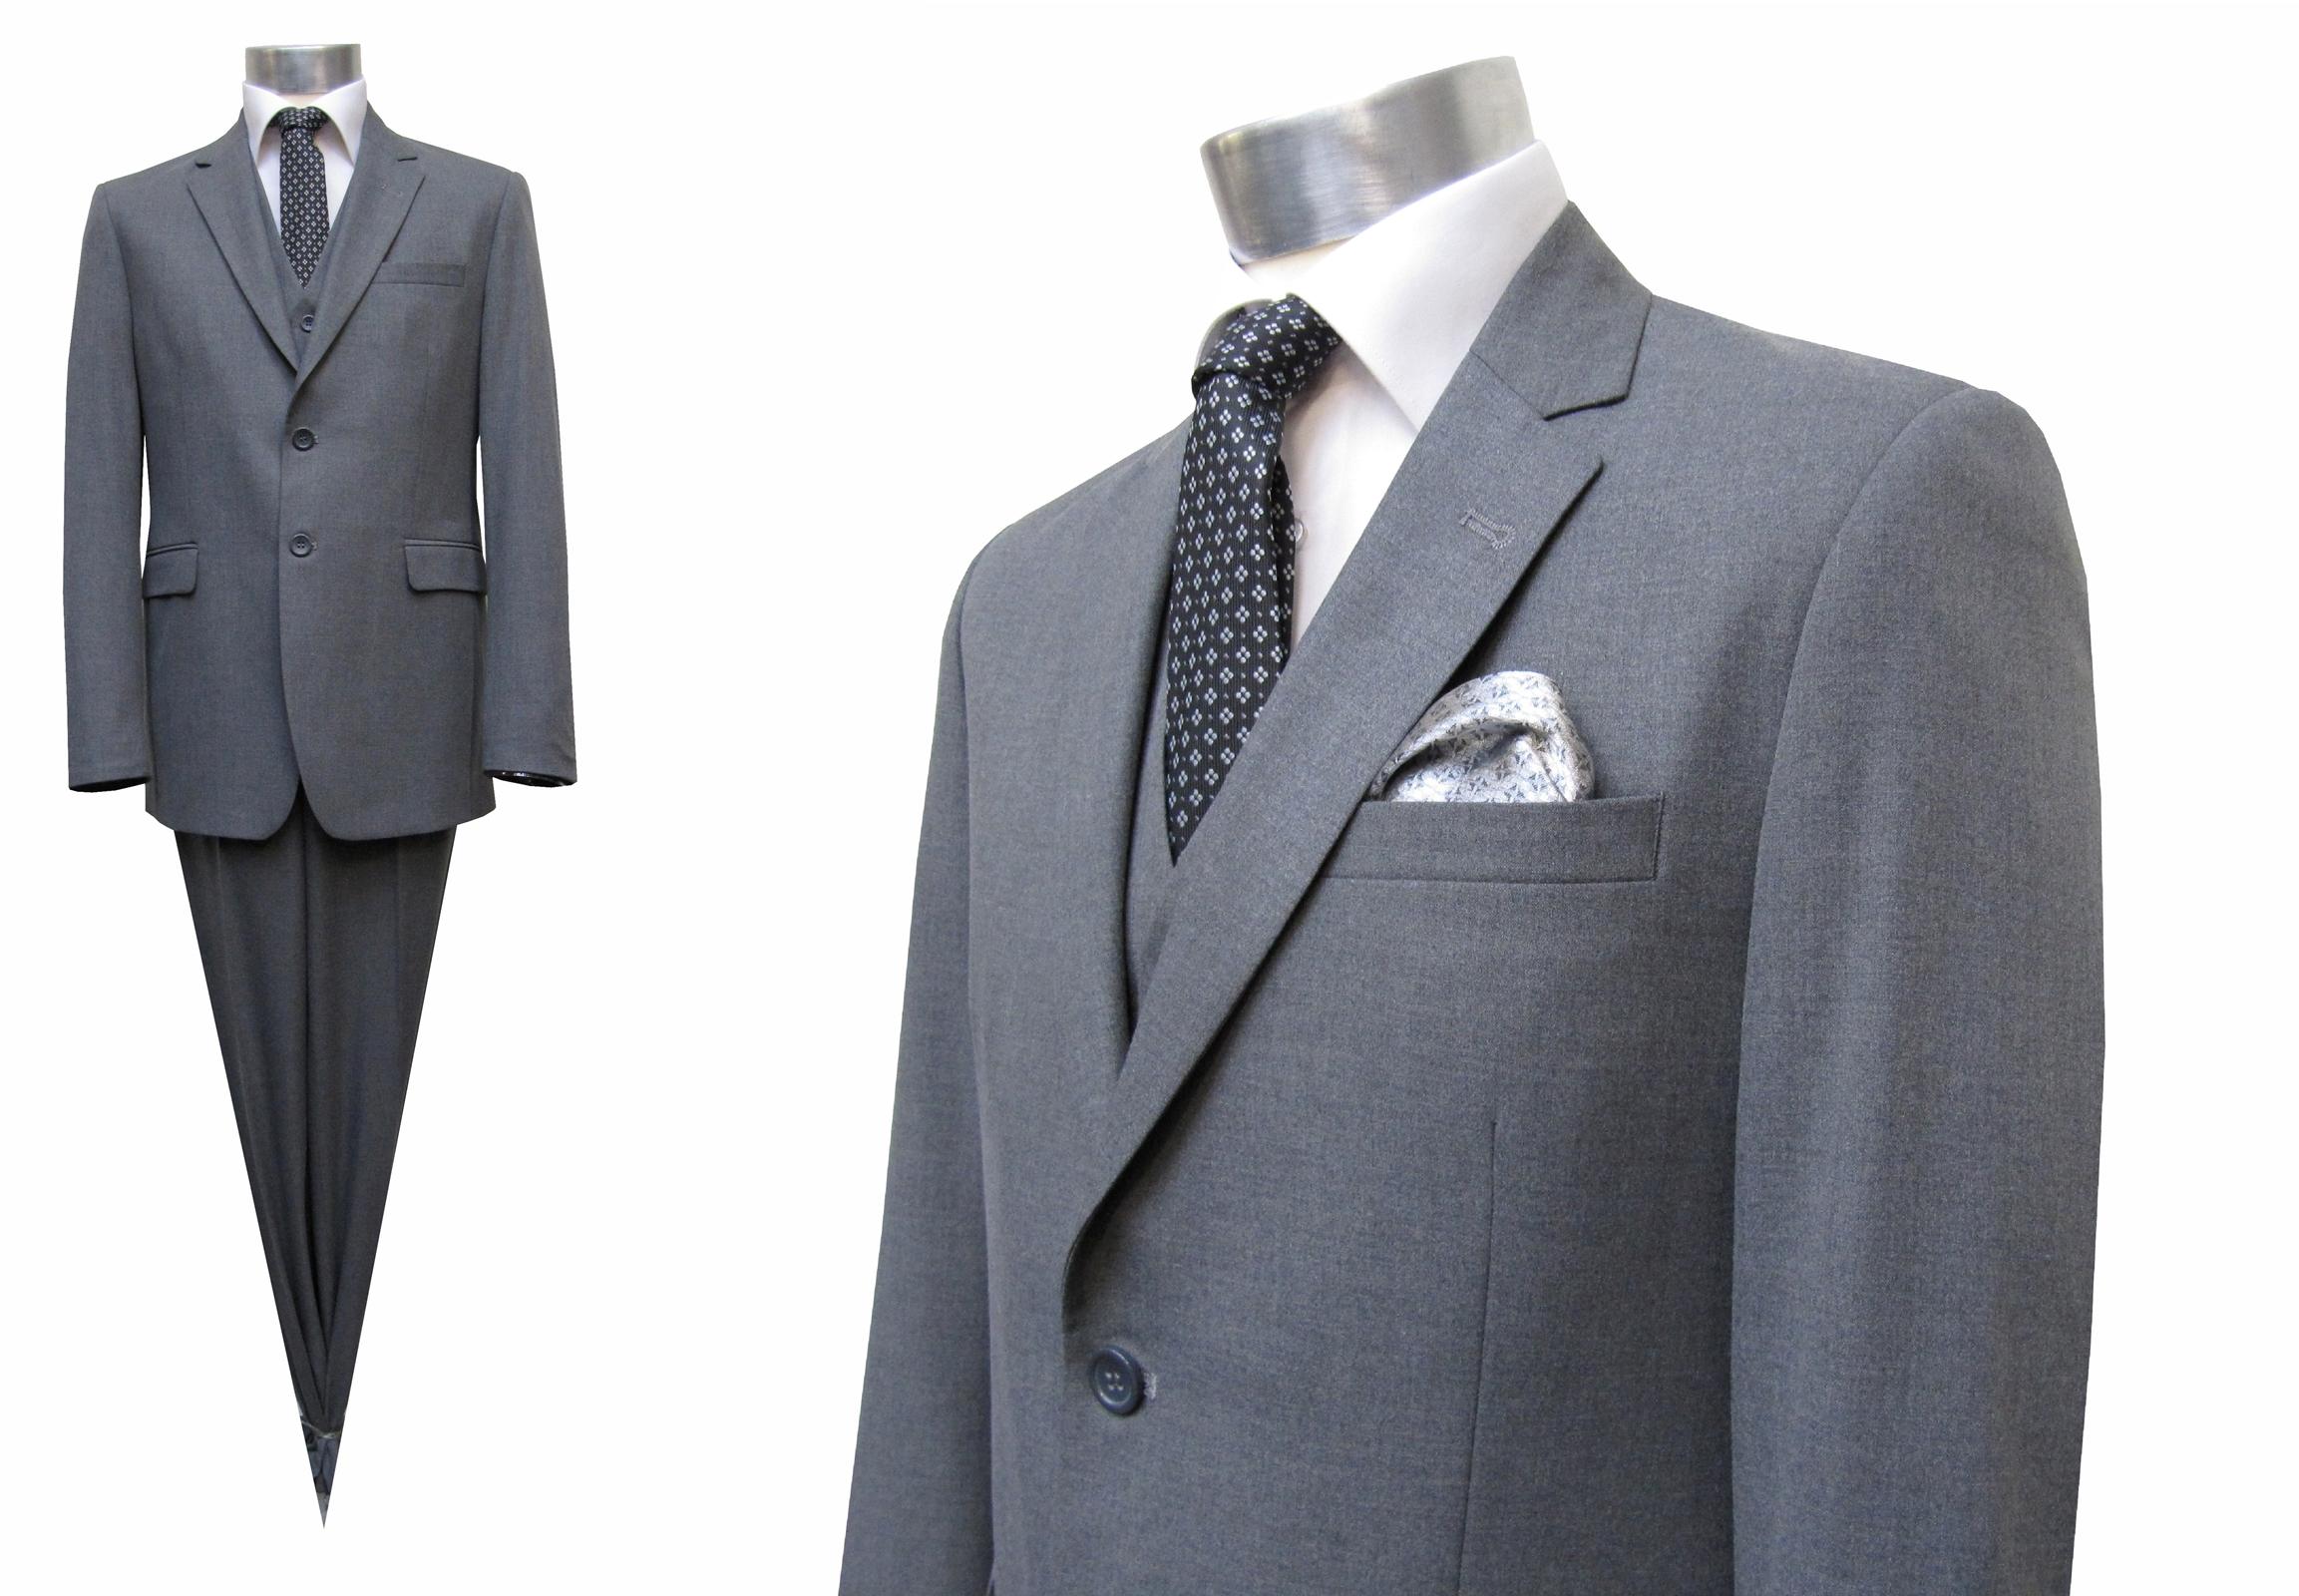 Anzug Uni-Schurwolle - Muga Herrenausstatter Hochzeit Mode d485461d7d